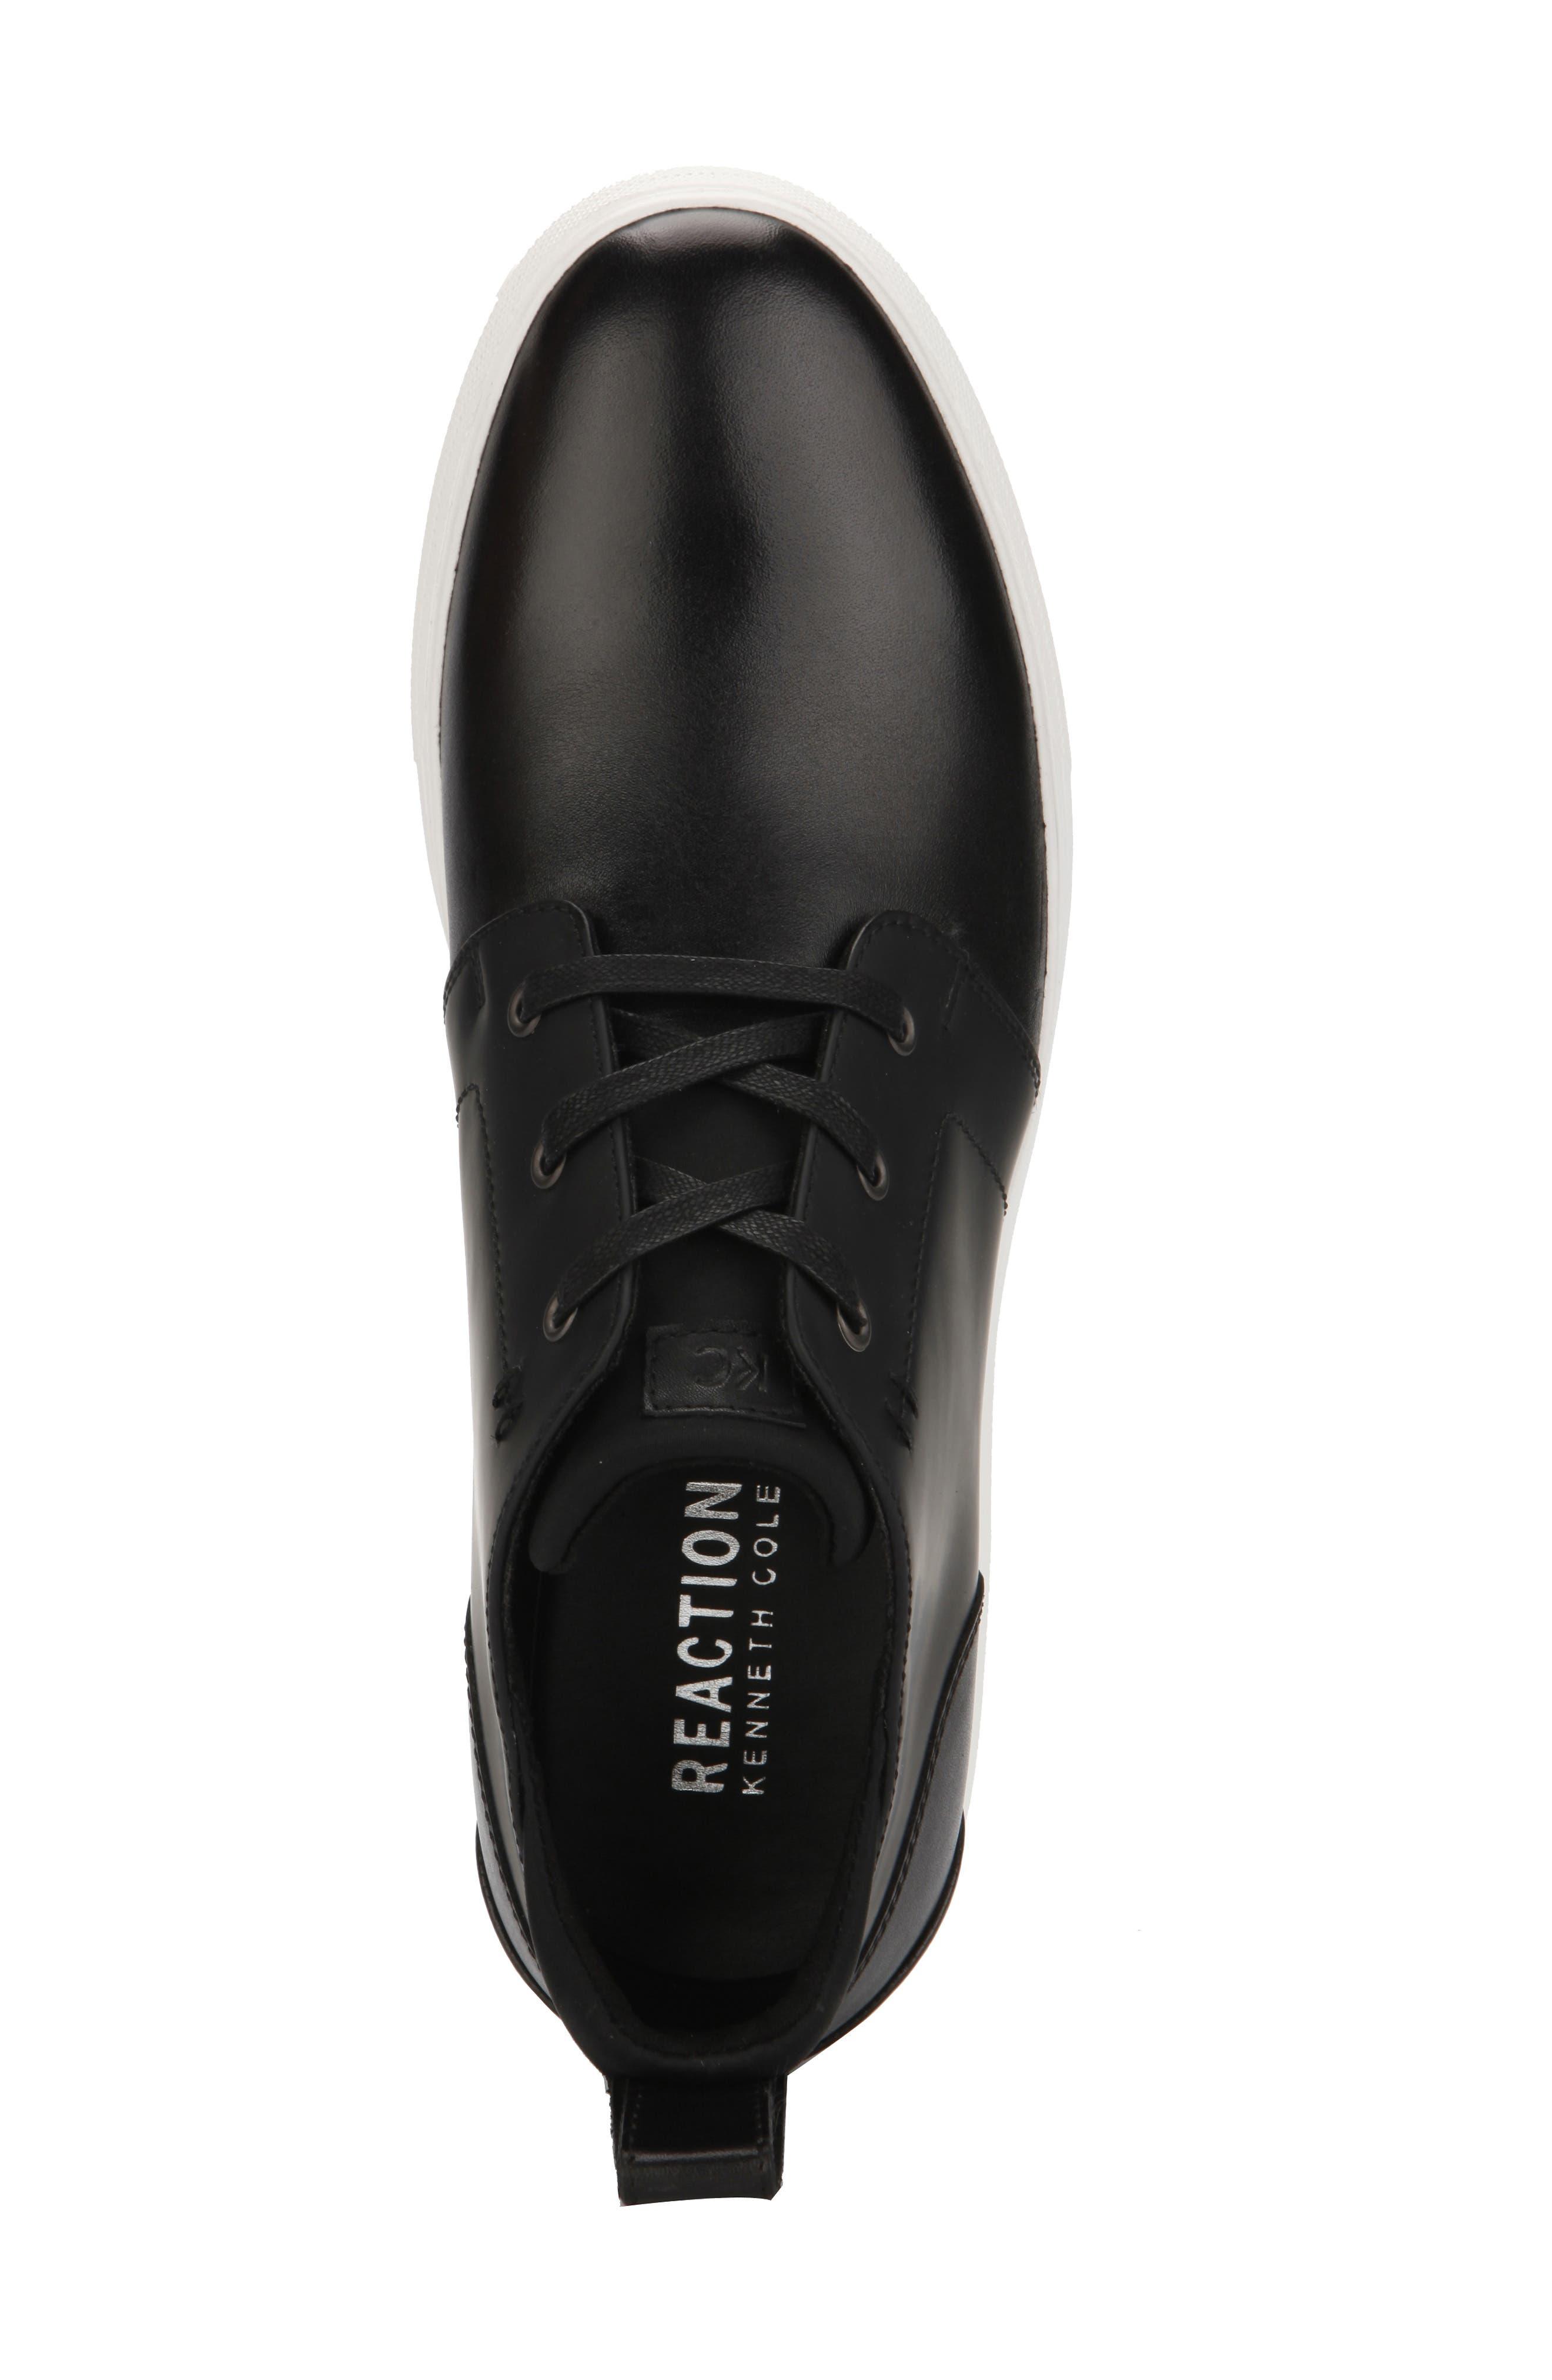 REACTION KENNETH COLE, Reemer Chukka Sneaker, Alternate thumbnail 3, color, BLACK